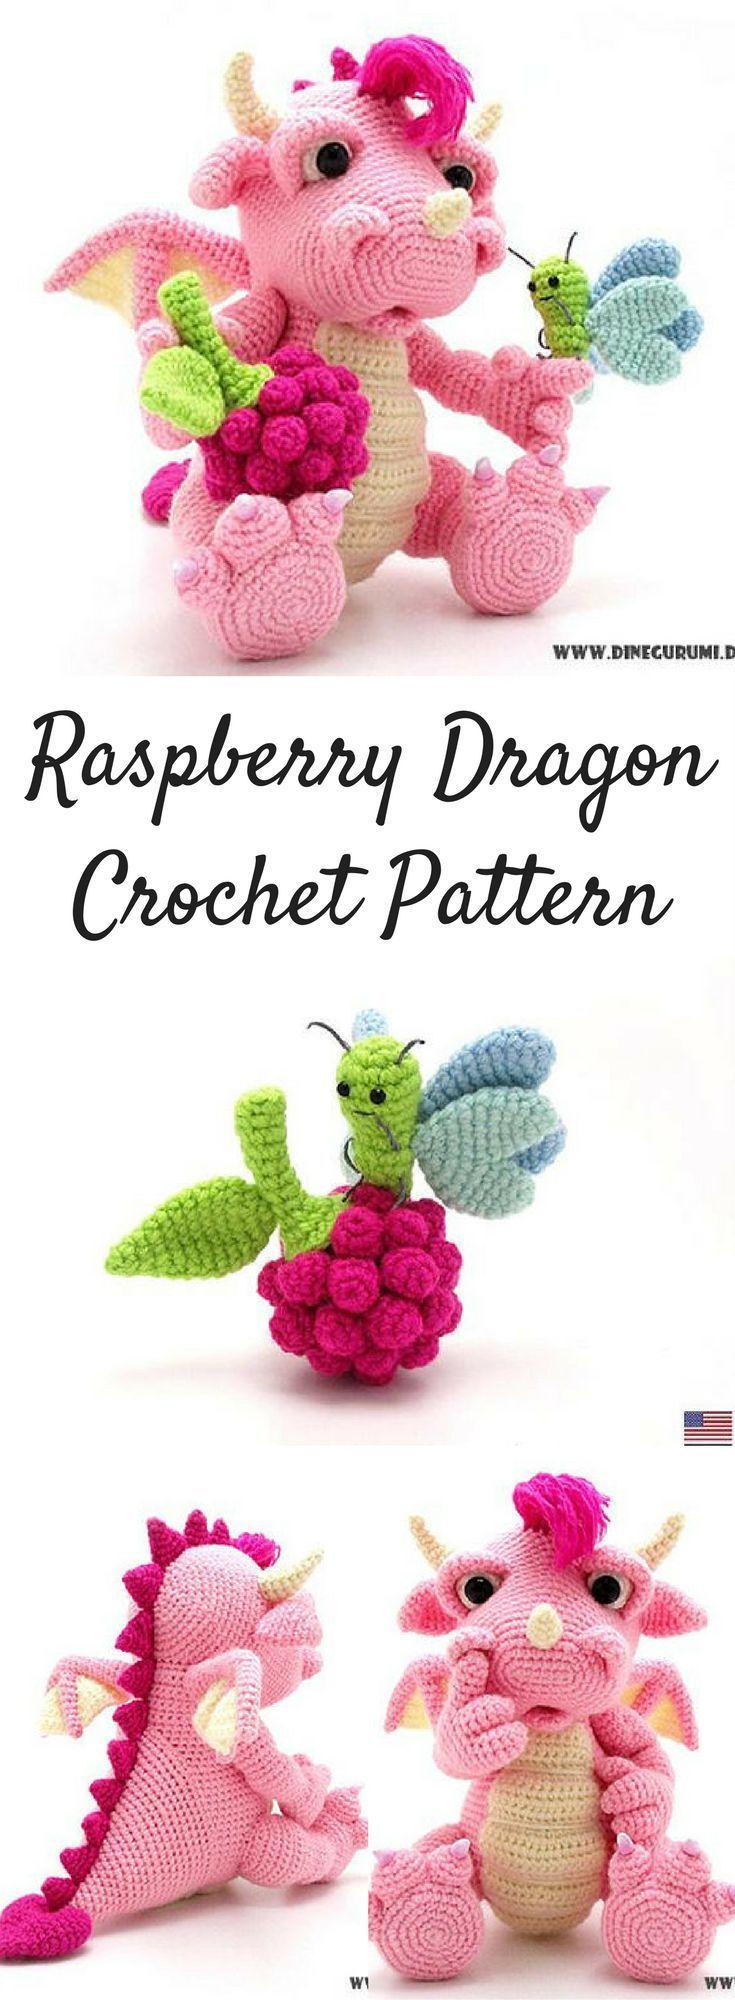 Raspberry Dragon Amigurumi Crochet Pattern Printable | abrigo ...